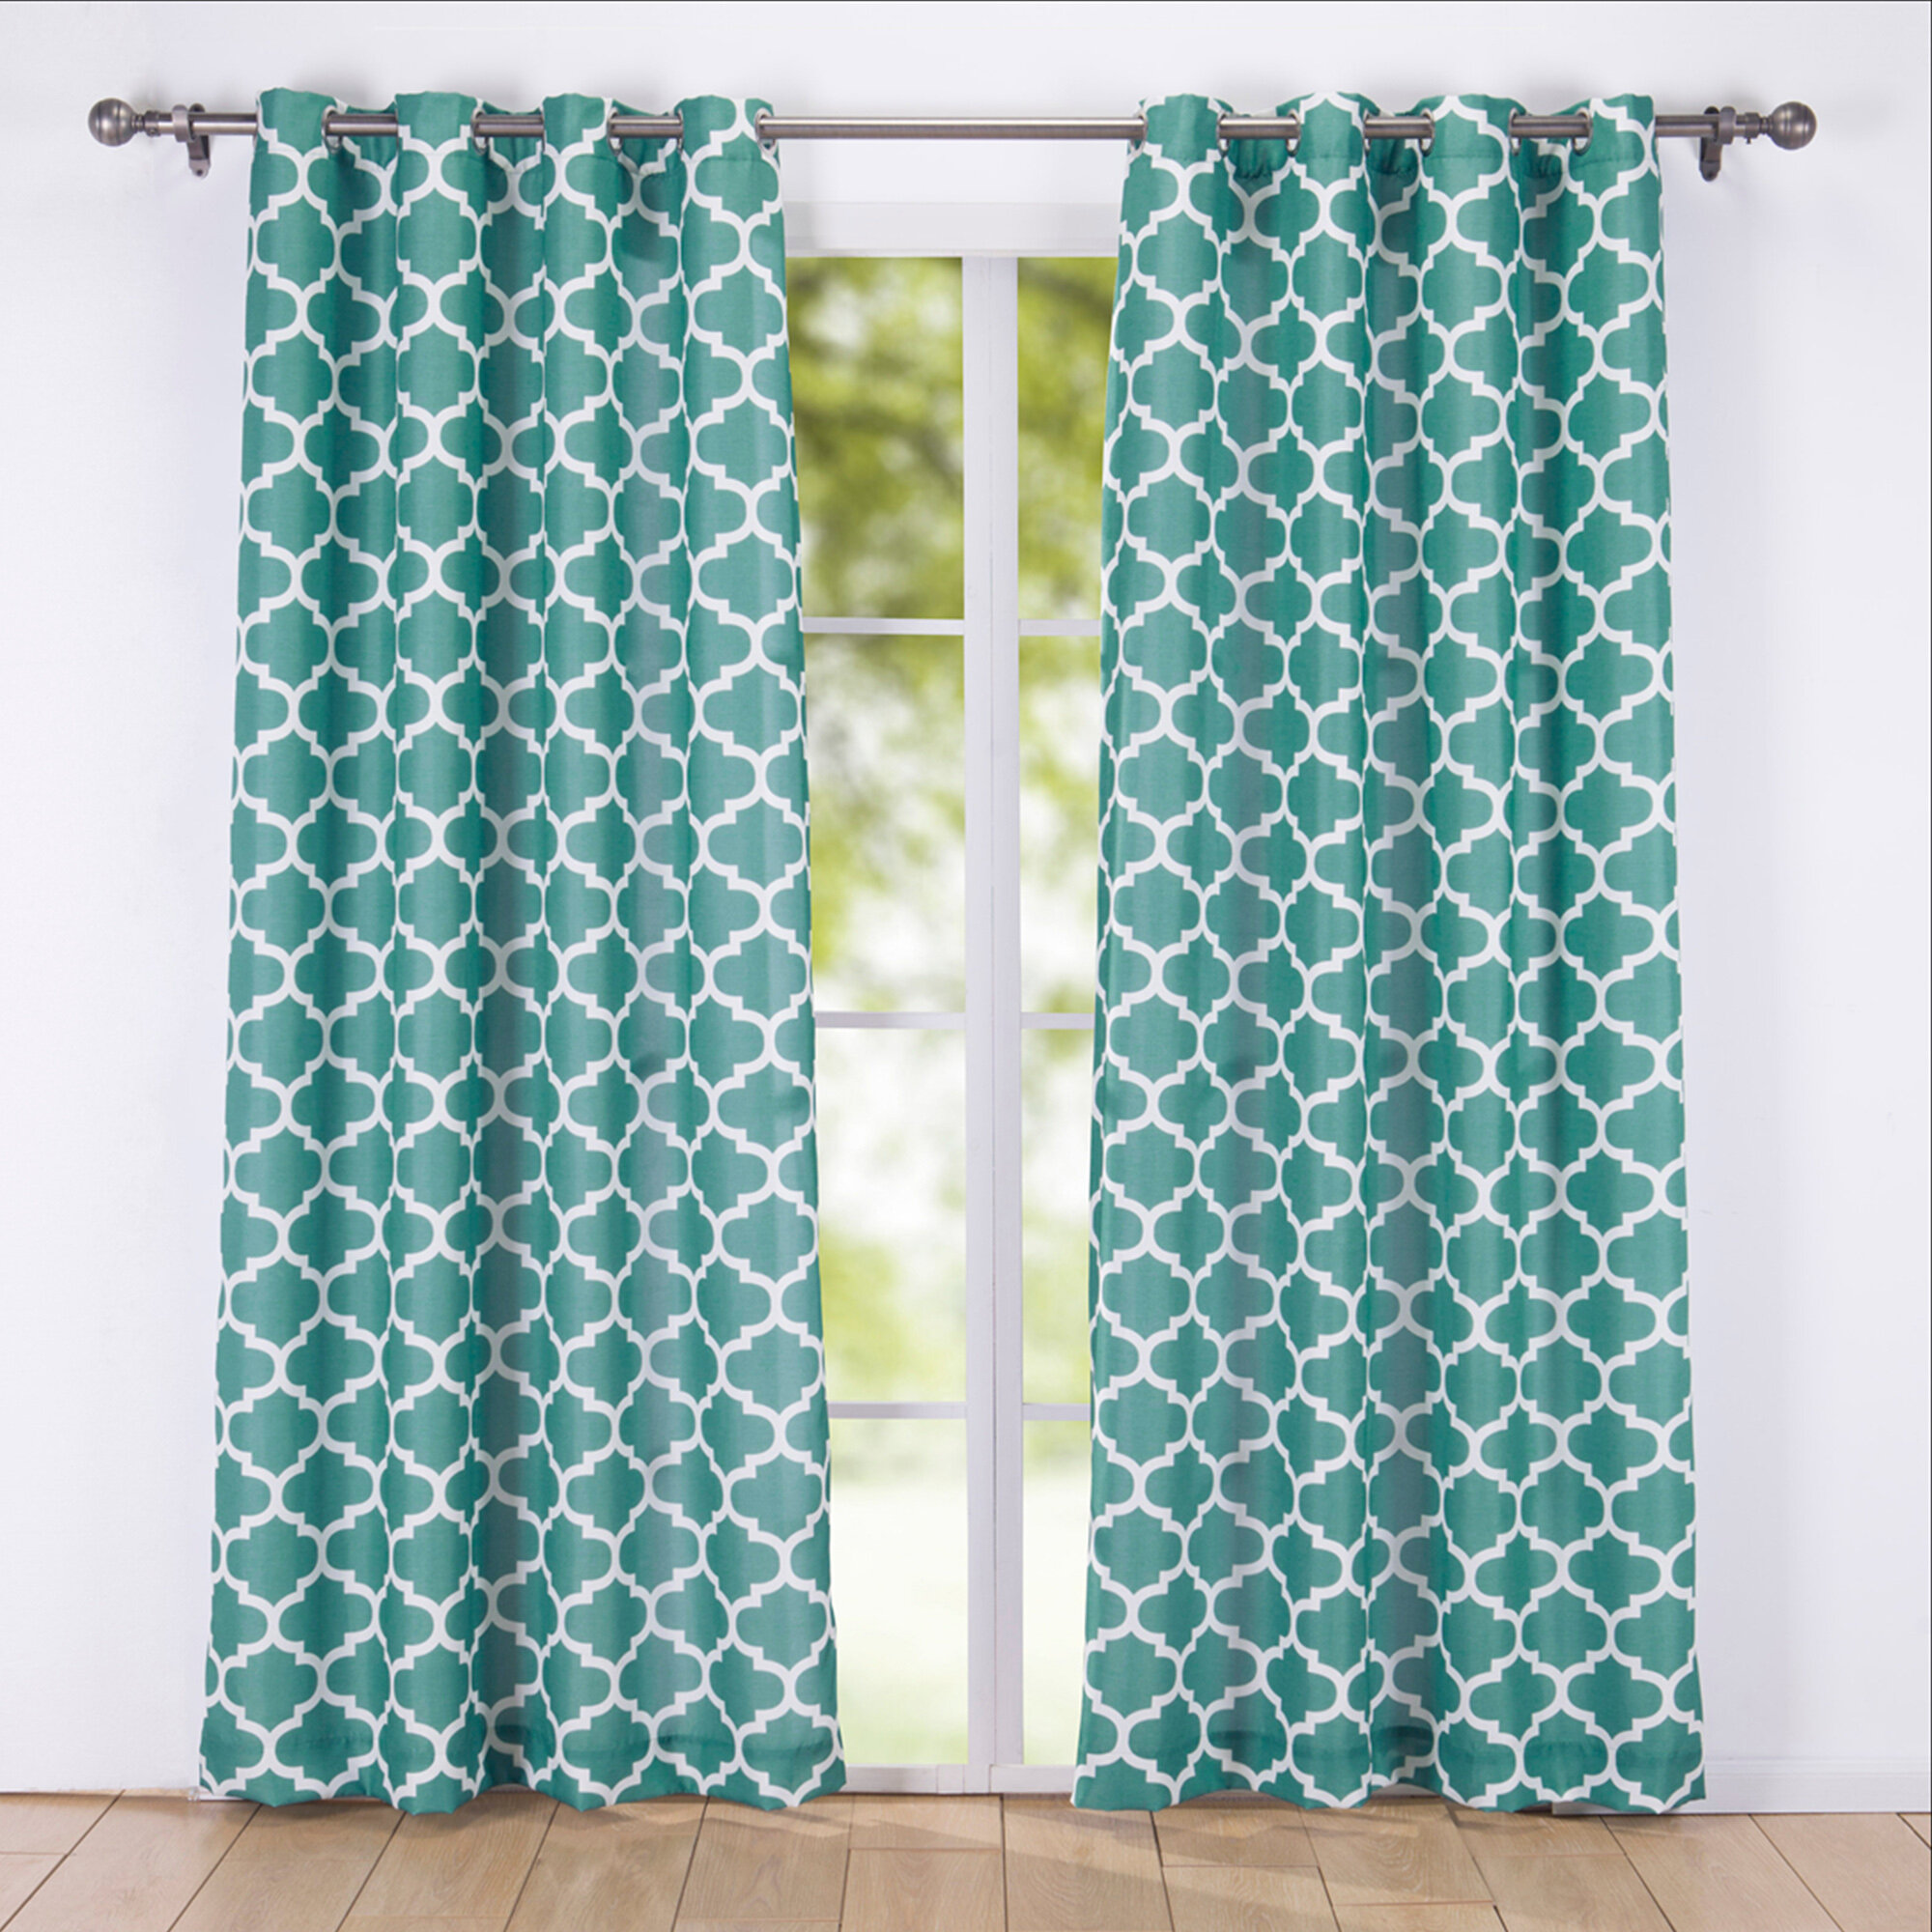 Ebern Designs Dulac Decorative Window Geometric Semi Sheer Grommet Curtain Panel Wayfair